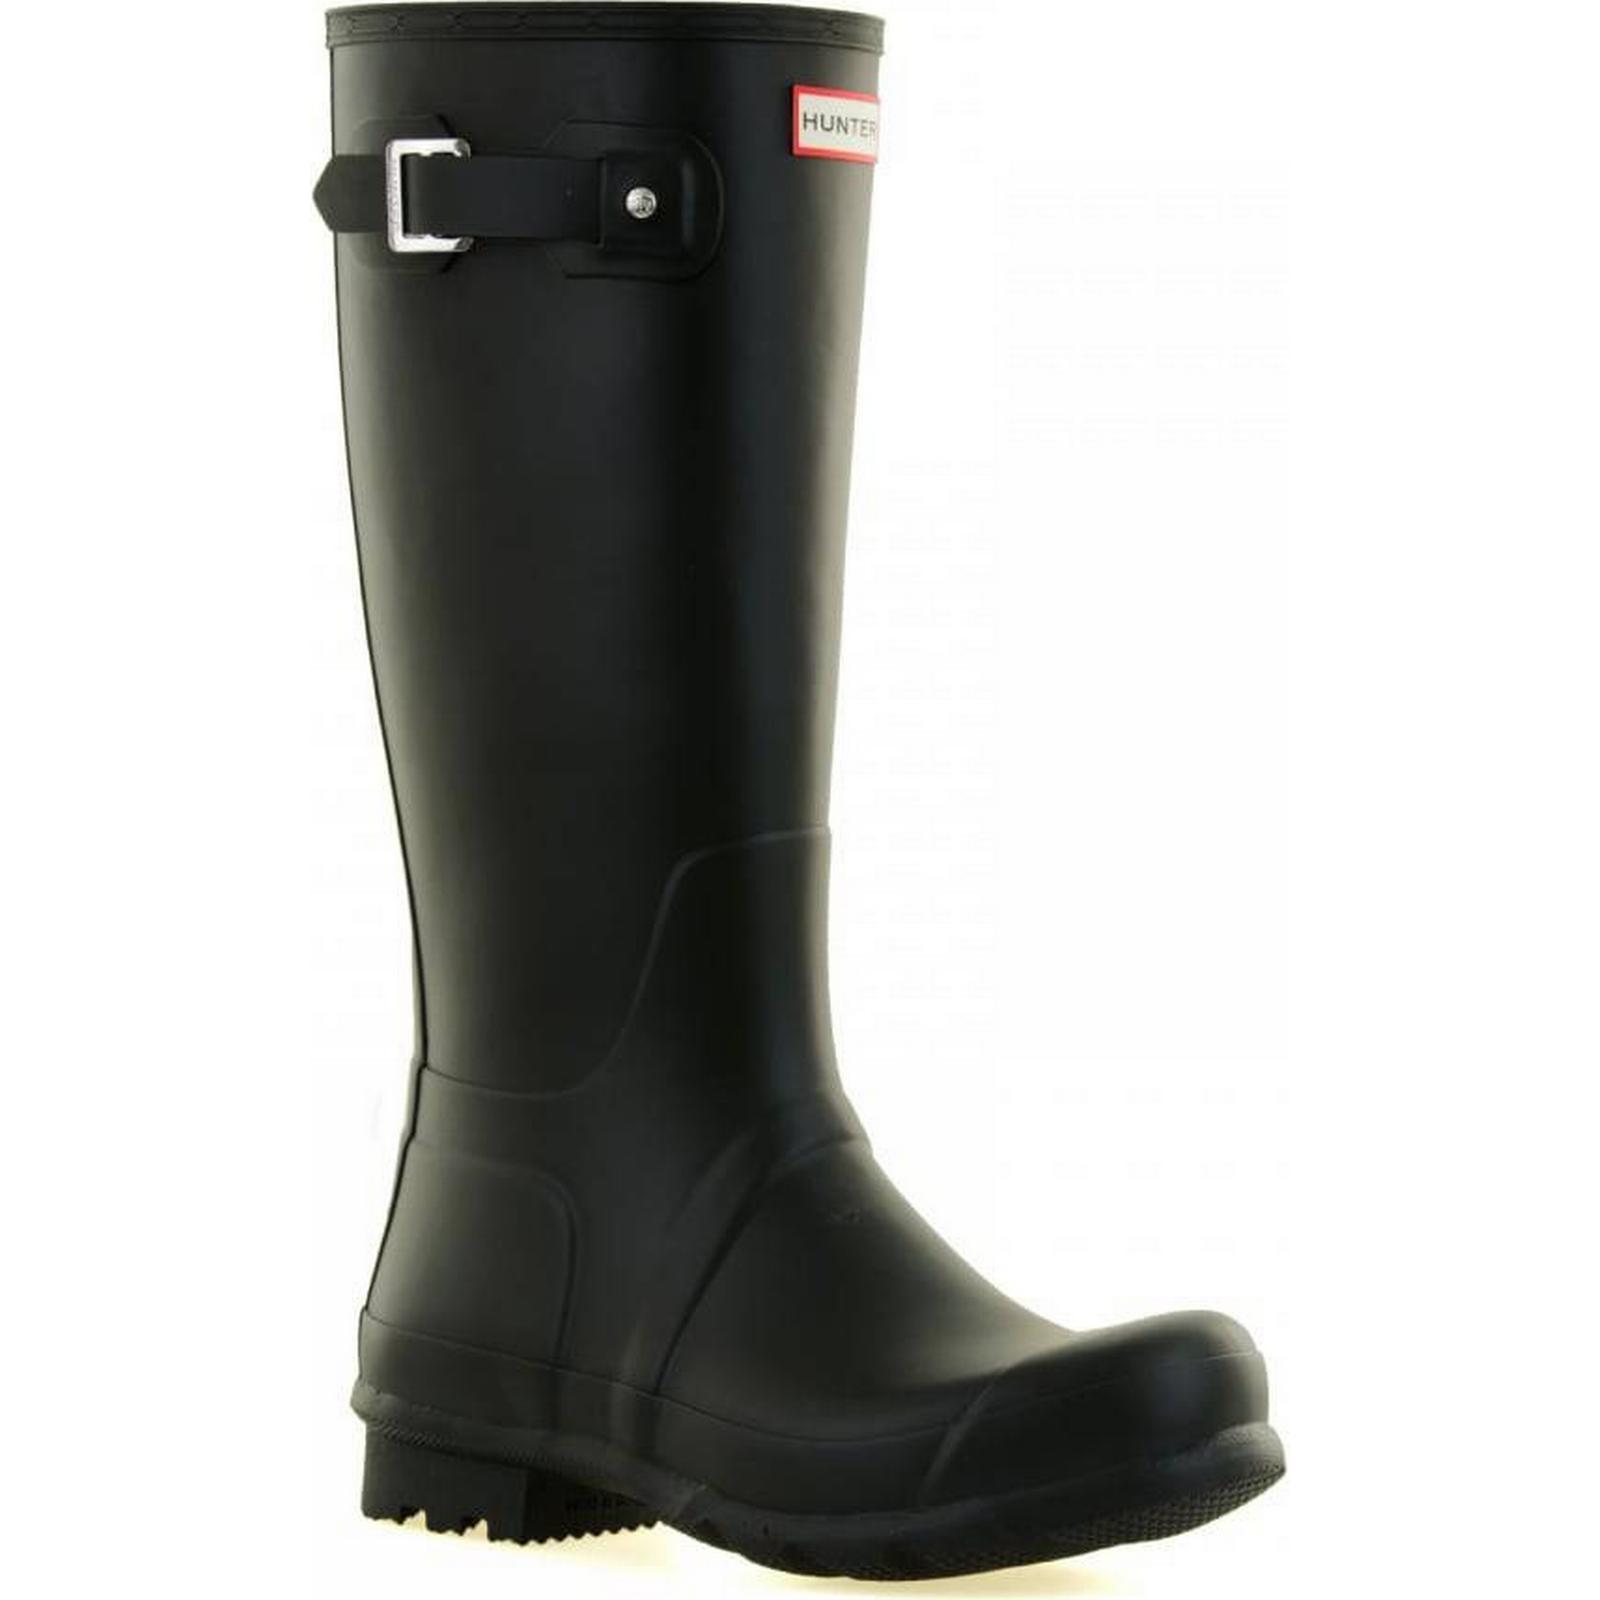 Hunter Mens Original Tall Wellington Boots BL (Black) Size: 8, Colour: BL Boots d77d70